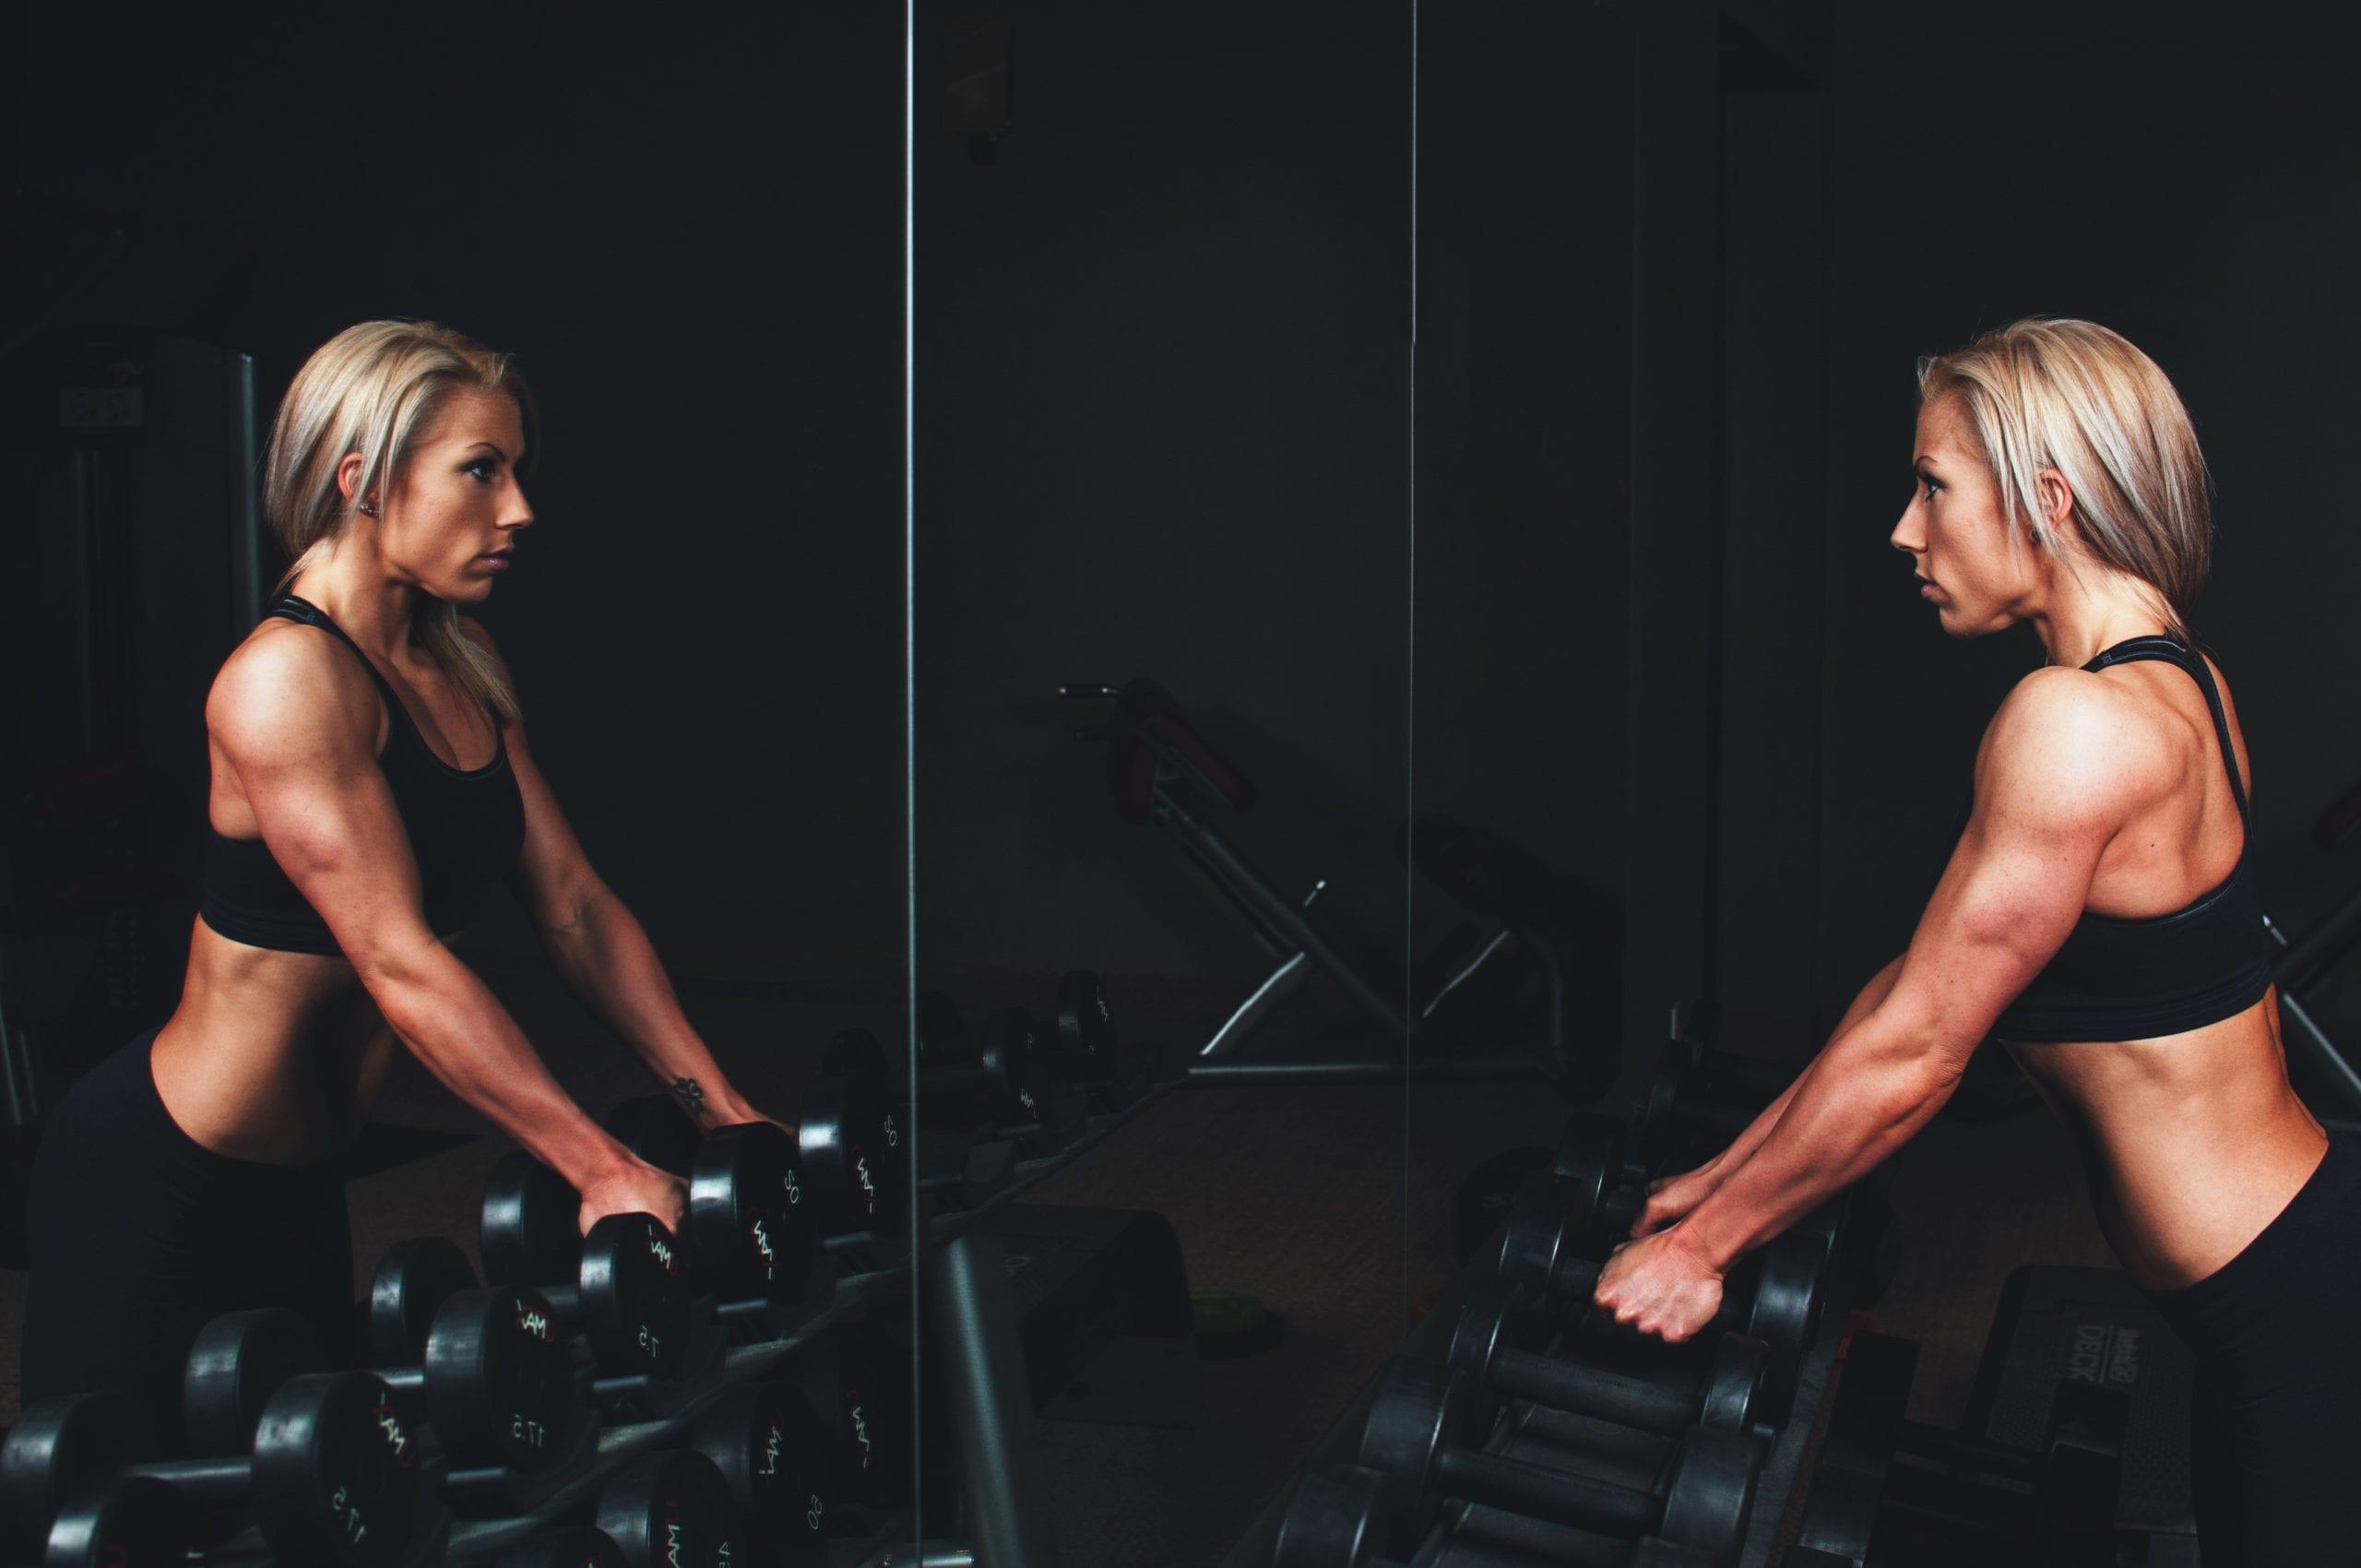 Female Bodybuilders Strong Women that All Men Desire